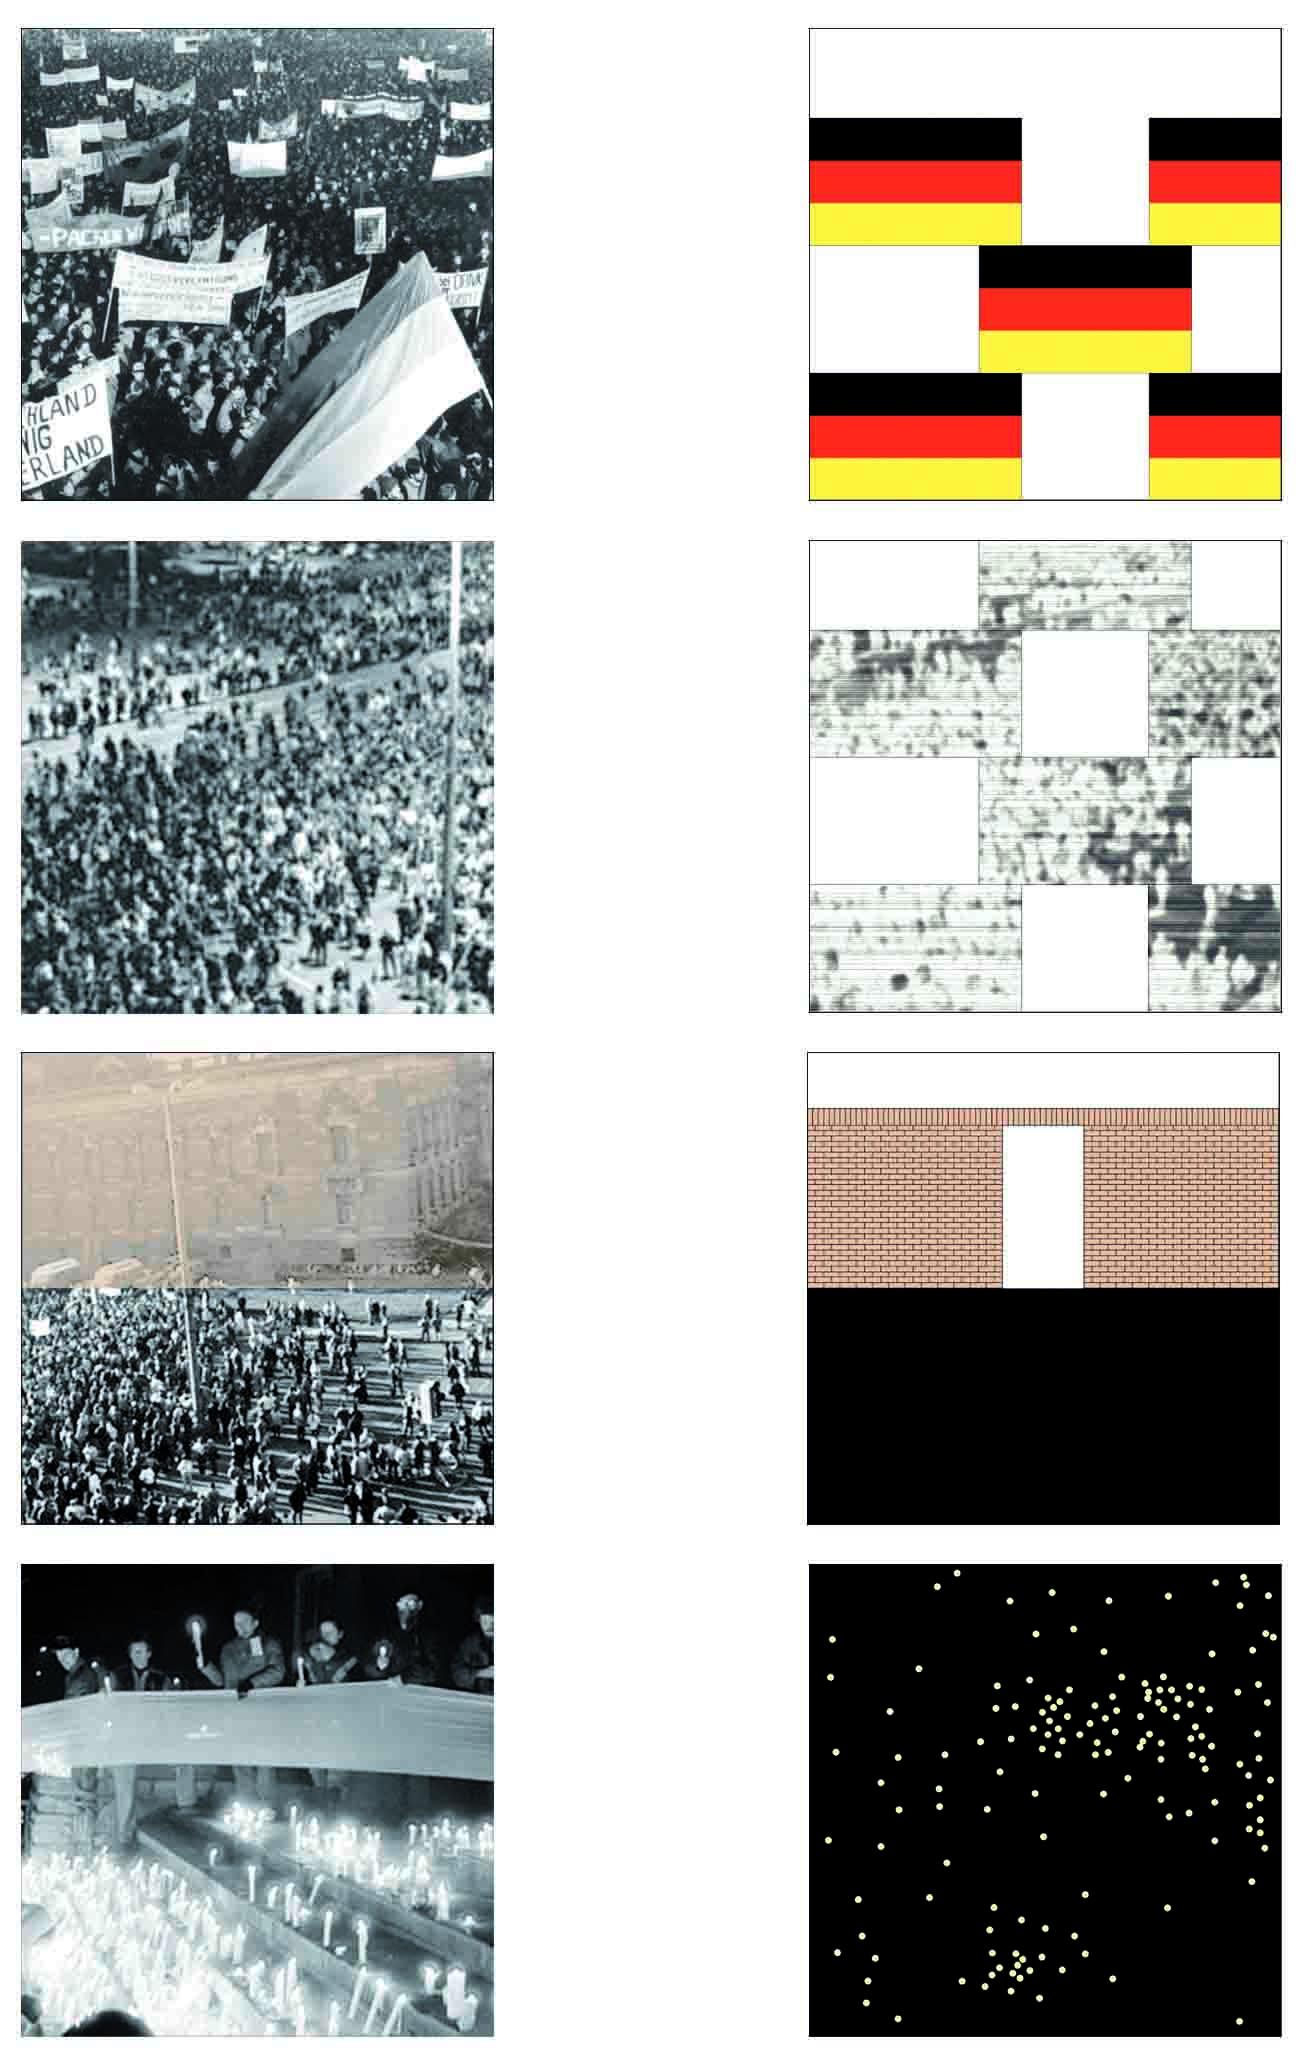 Einheitsdenkmal Berlin 11.jpg